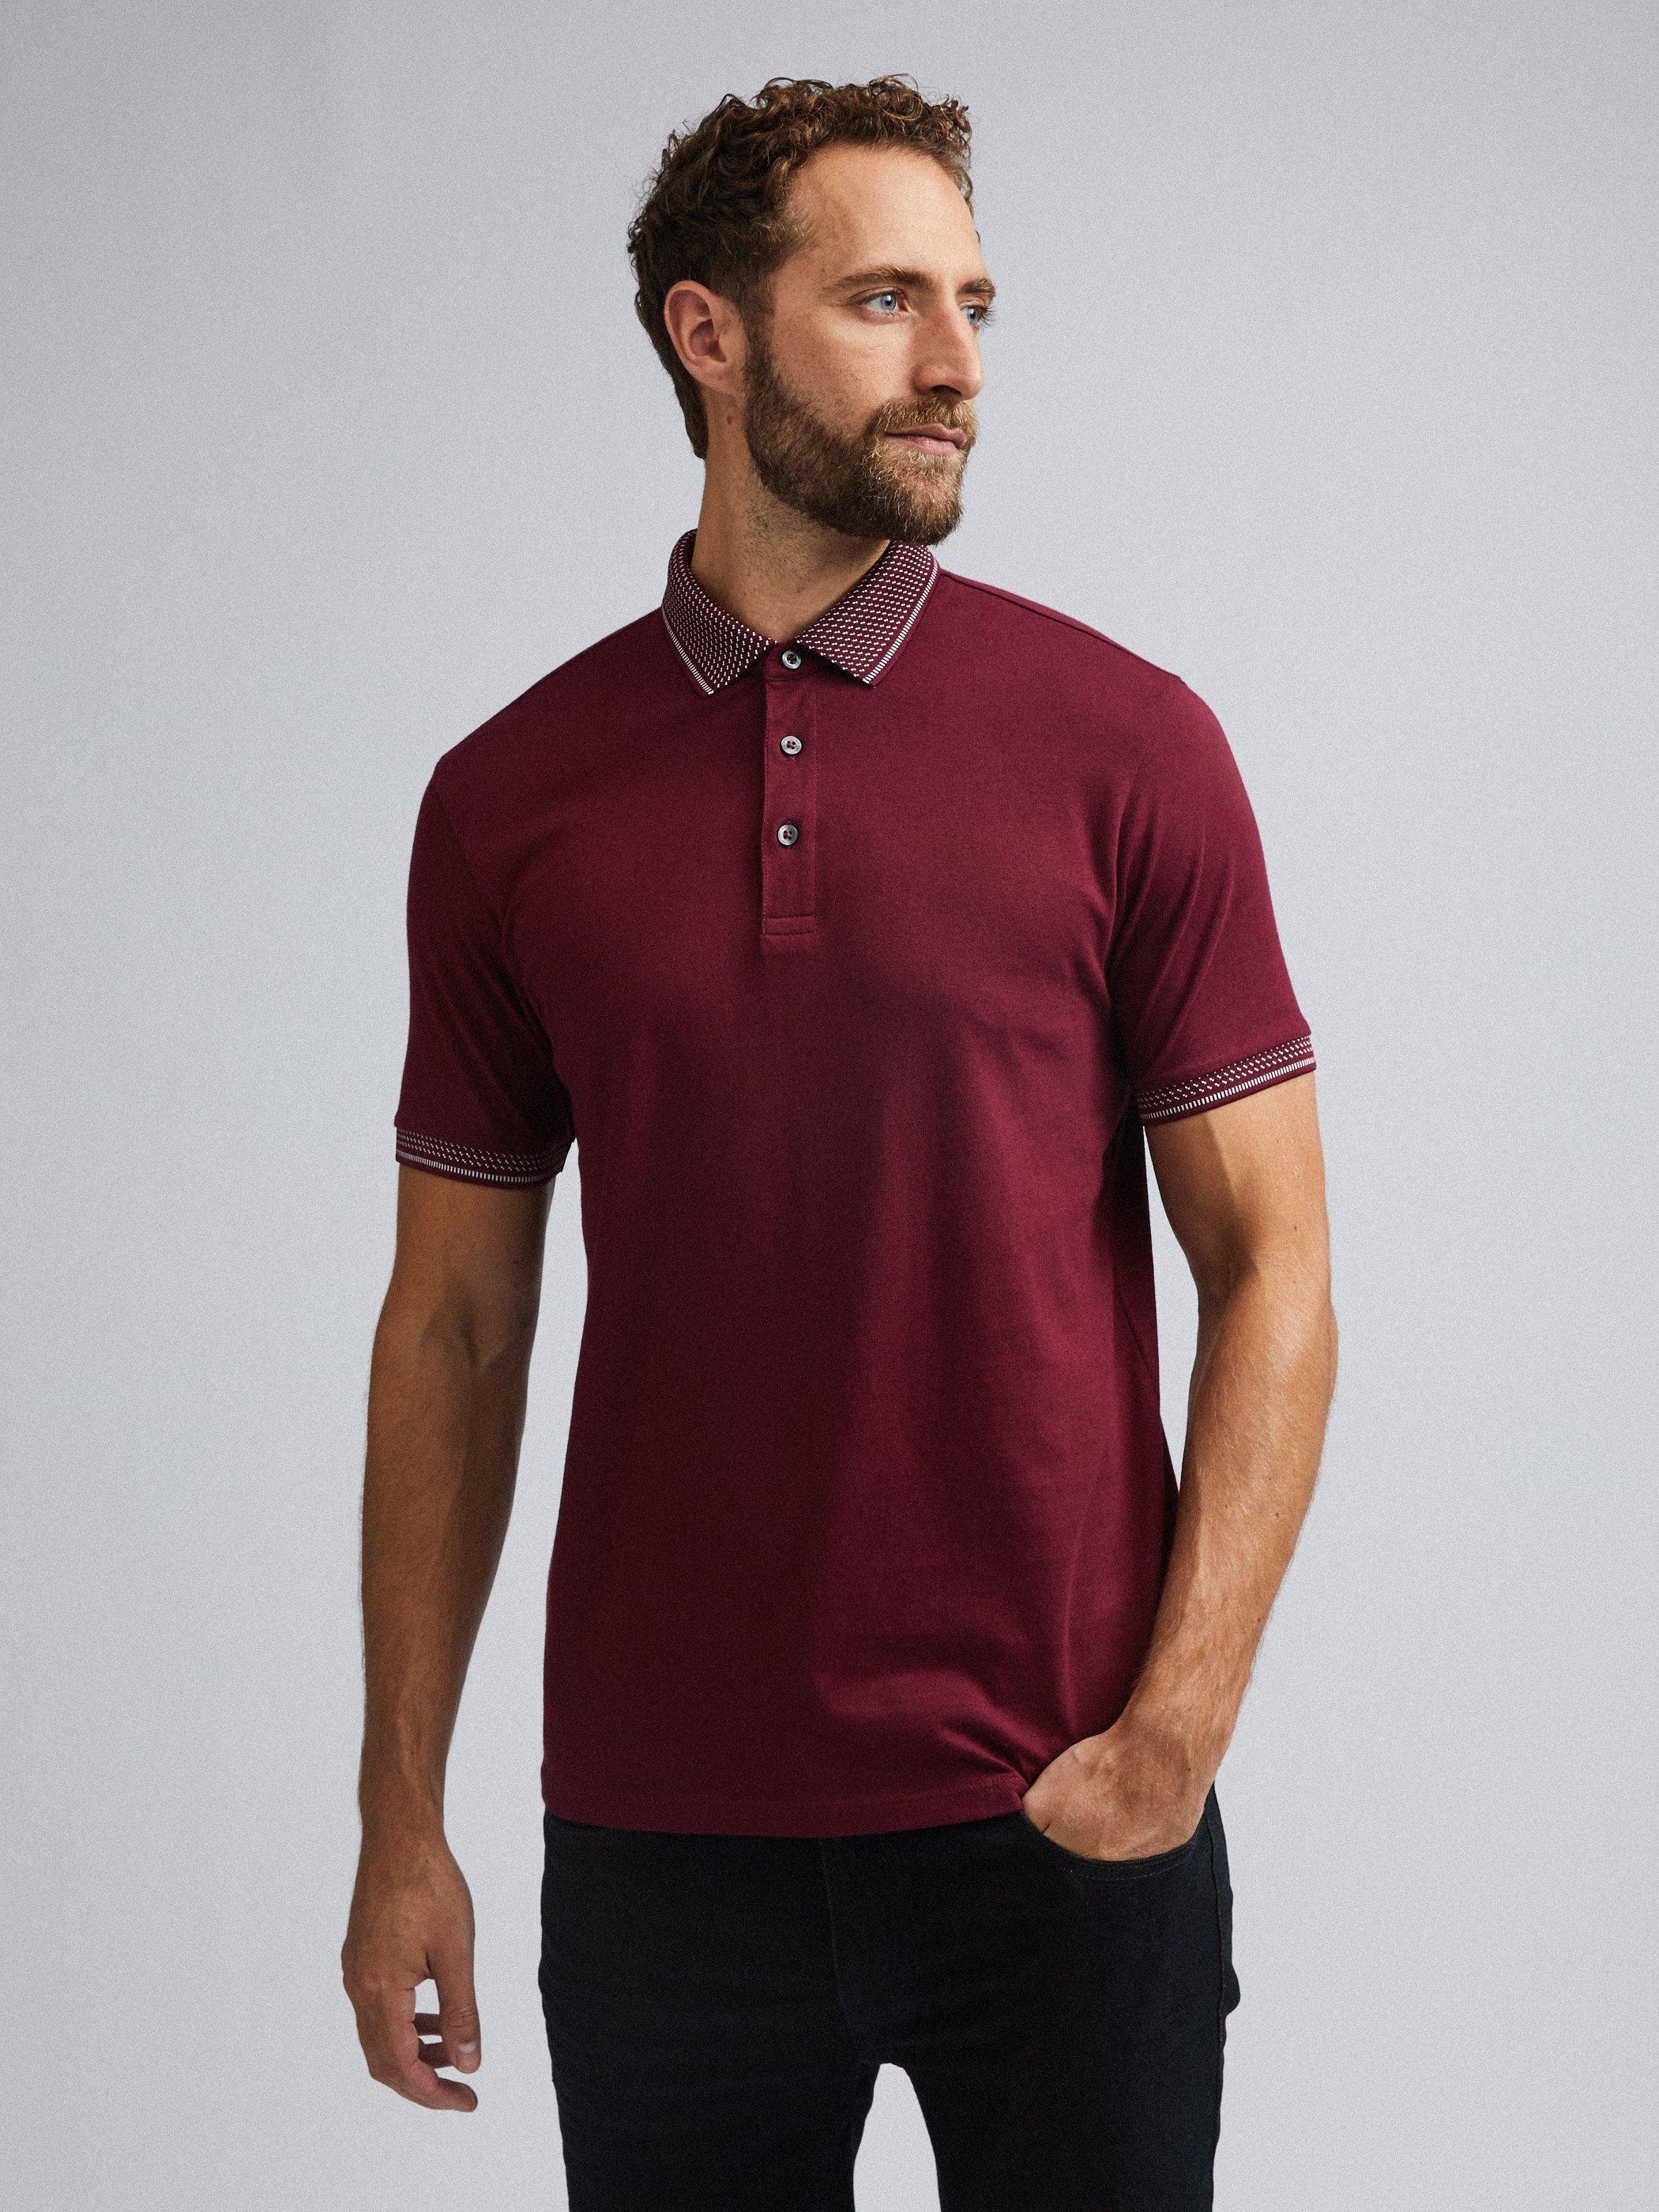 Men'S Burgundy Jacquard Collar Polo Shirt - S